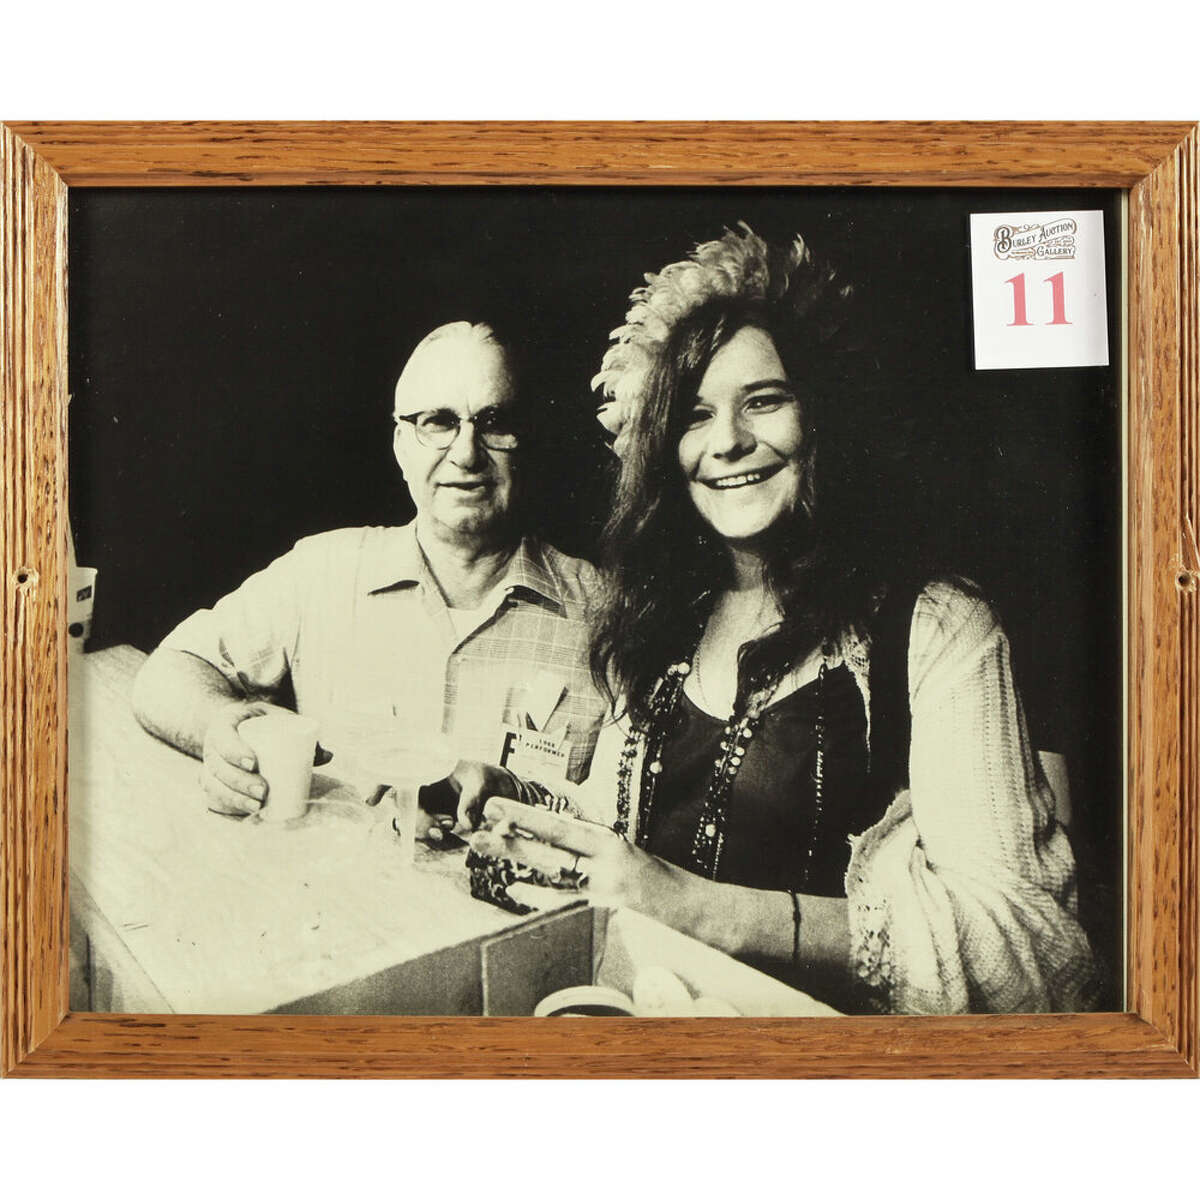 Janis Joplin & Kenneth Threadgill Photograph.